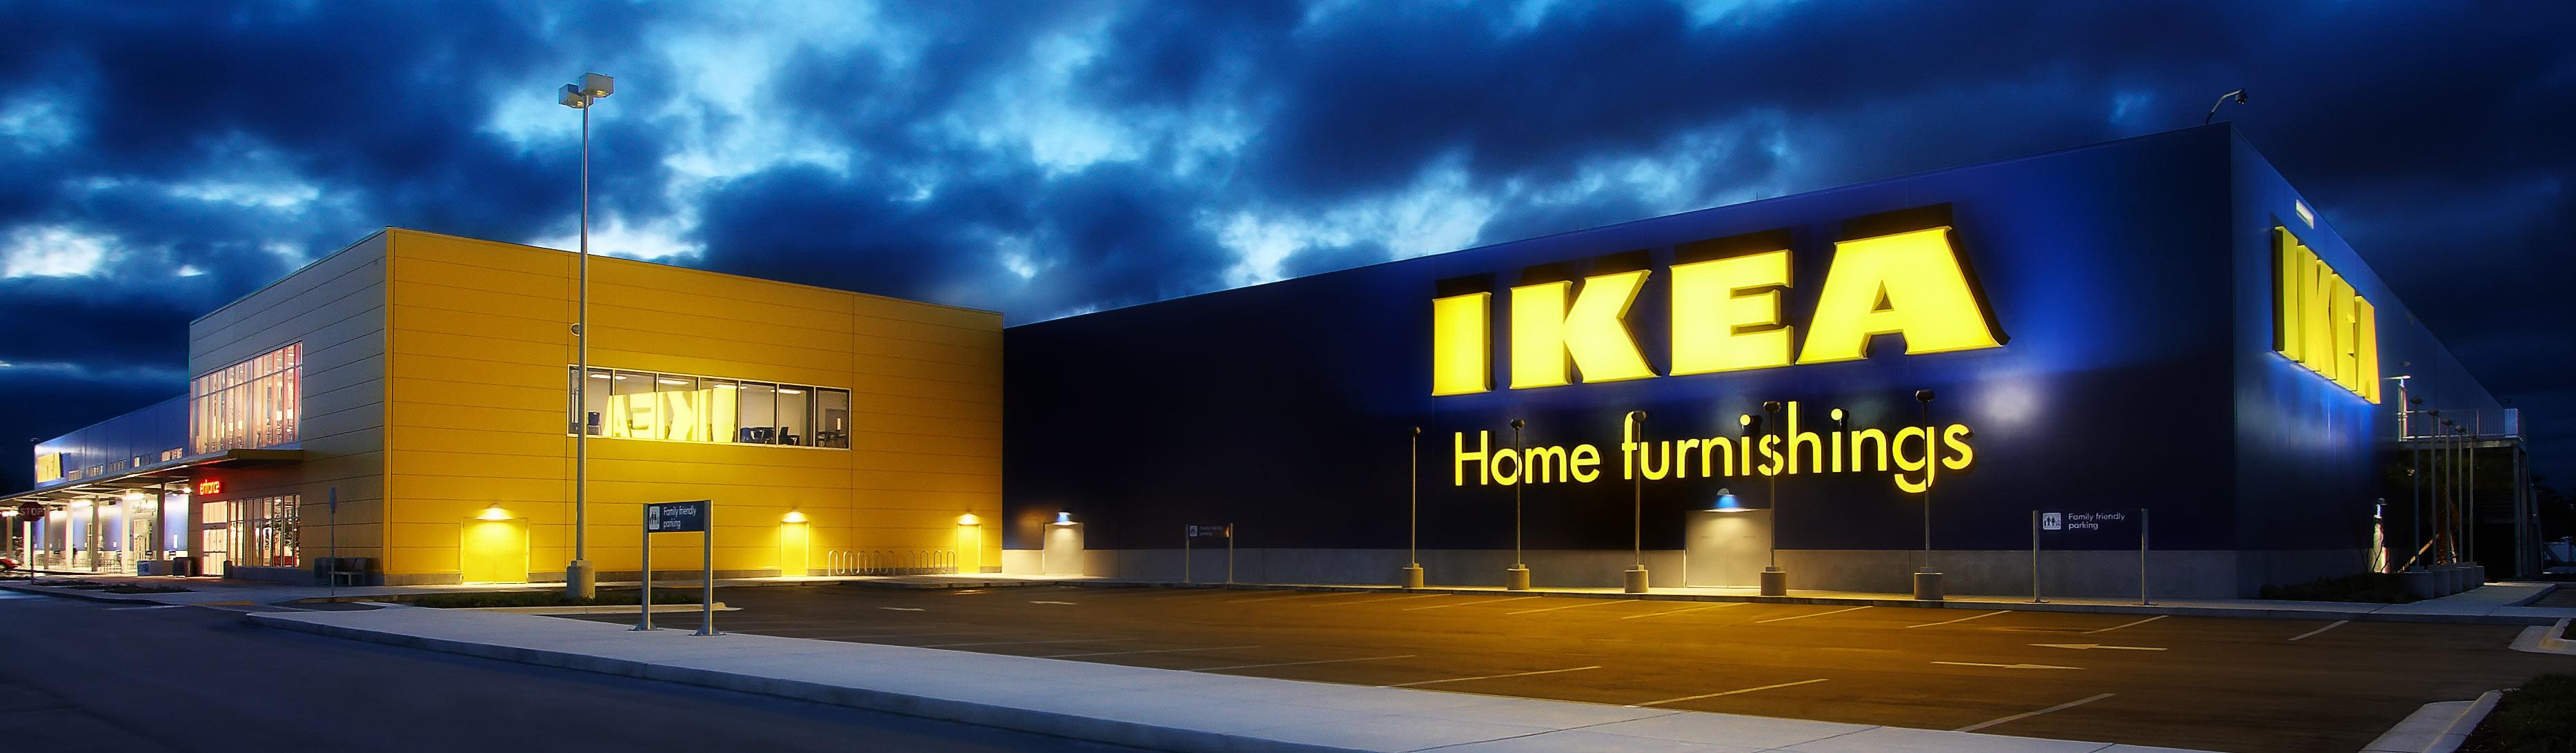 ikea-ανοιχτα-κυριακη-15-ιουλίου-2018-μαγαζια-σουπερ-μαρκετ-καταστηματα-ανοιχτα-θερινές-εκπτώσεις-ικεα-2018